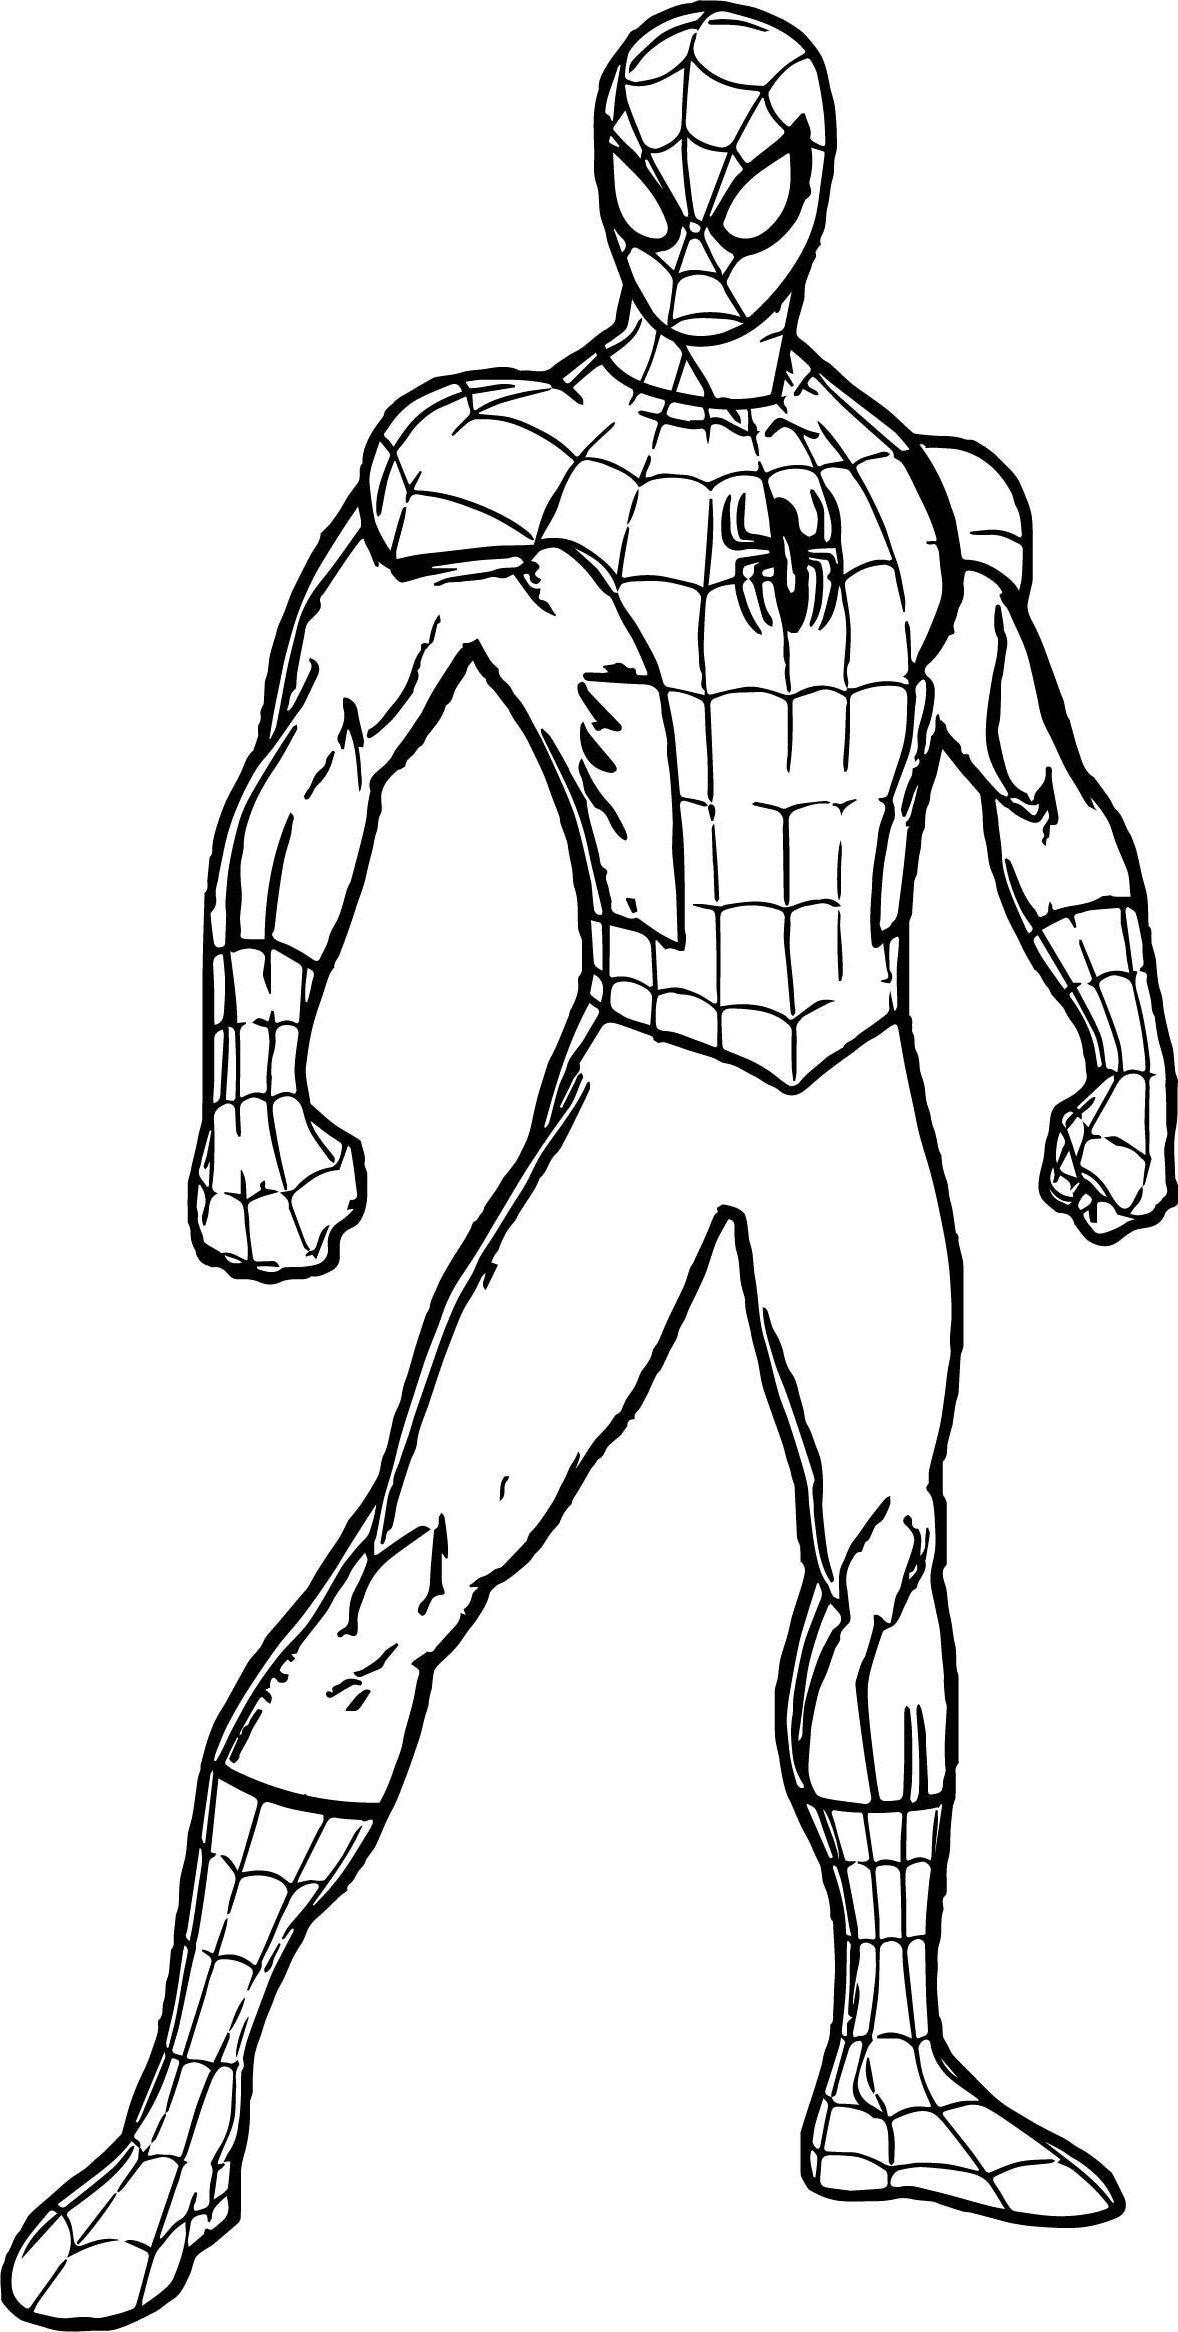 Spiderman Suit Coloring Page In 2020 Superhero Coloring Superhero Coloring Pages Spiderman Coloring